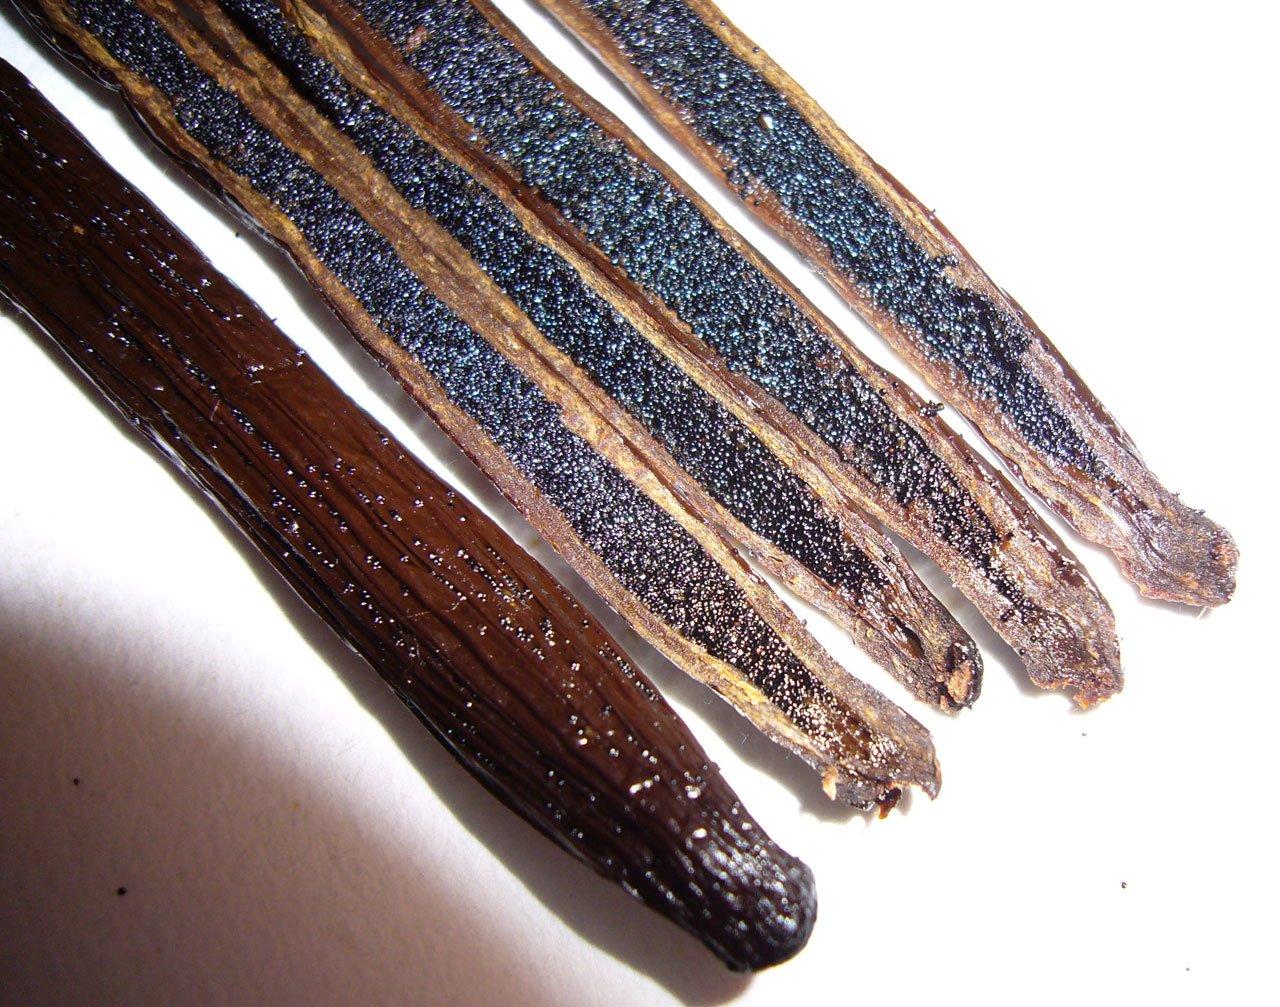 Madagascar Vanilla Beans. Whole Grade A Vanilla Pods for Vanilla Extract and Baking (10 Beans) by Vanilla Bean Kings (Image #5)